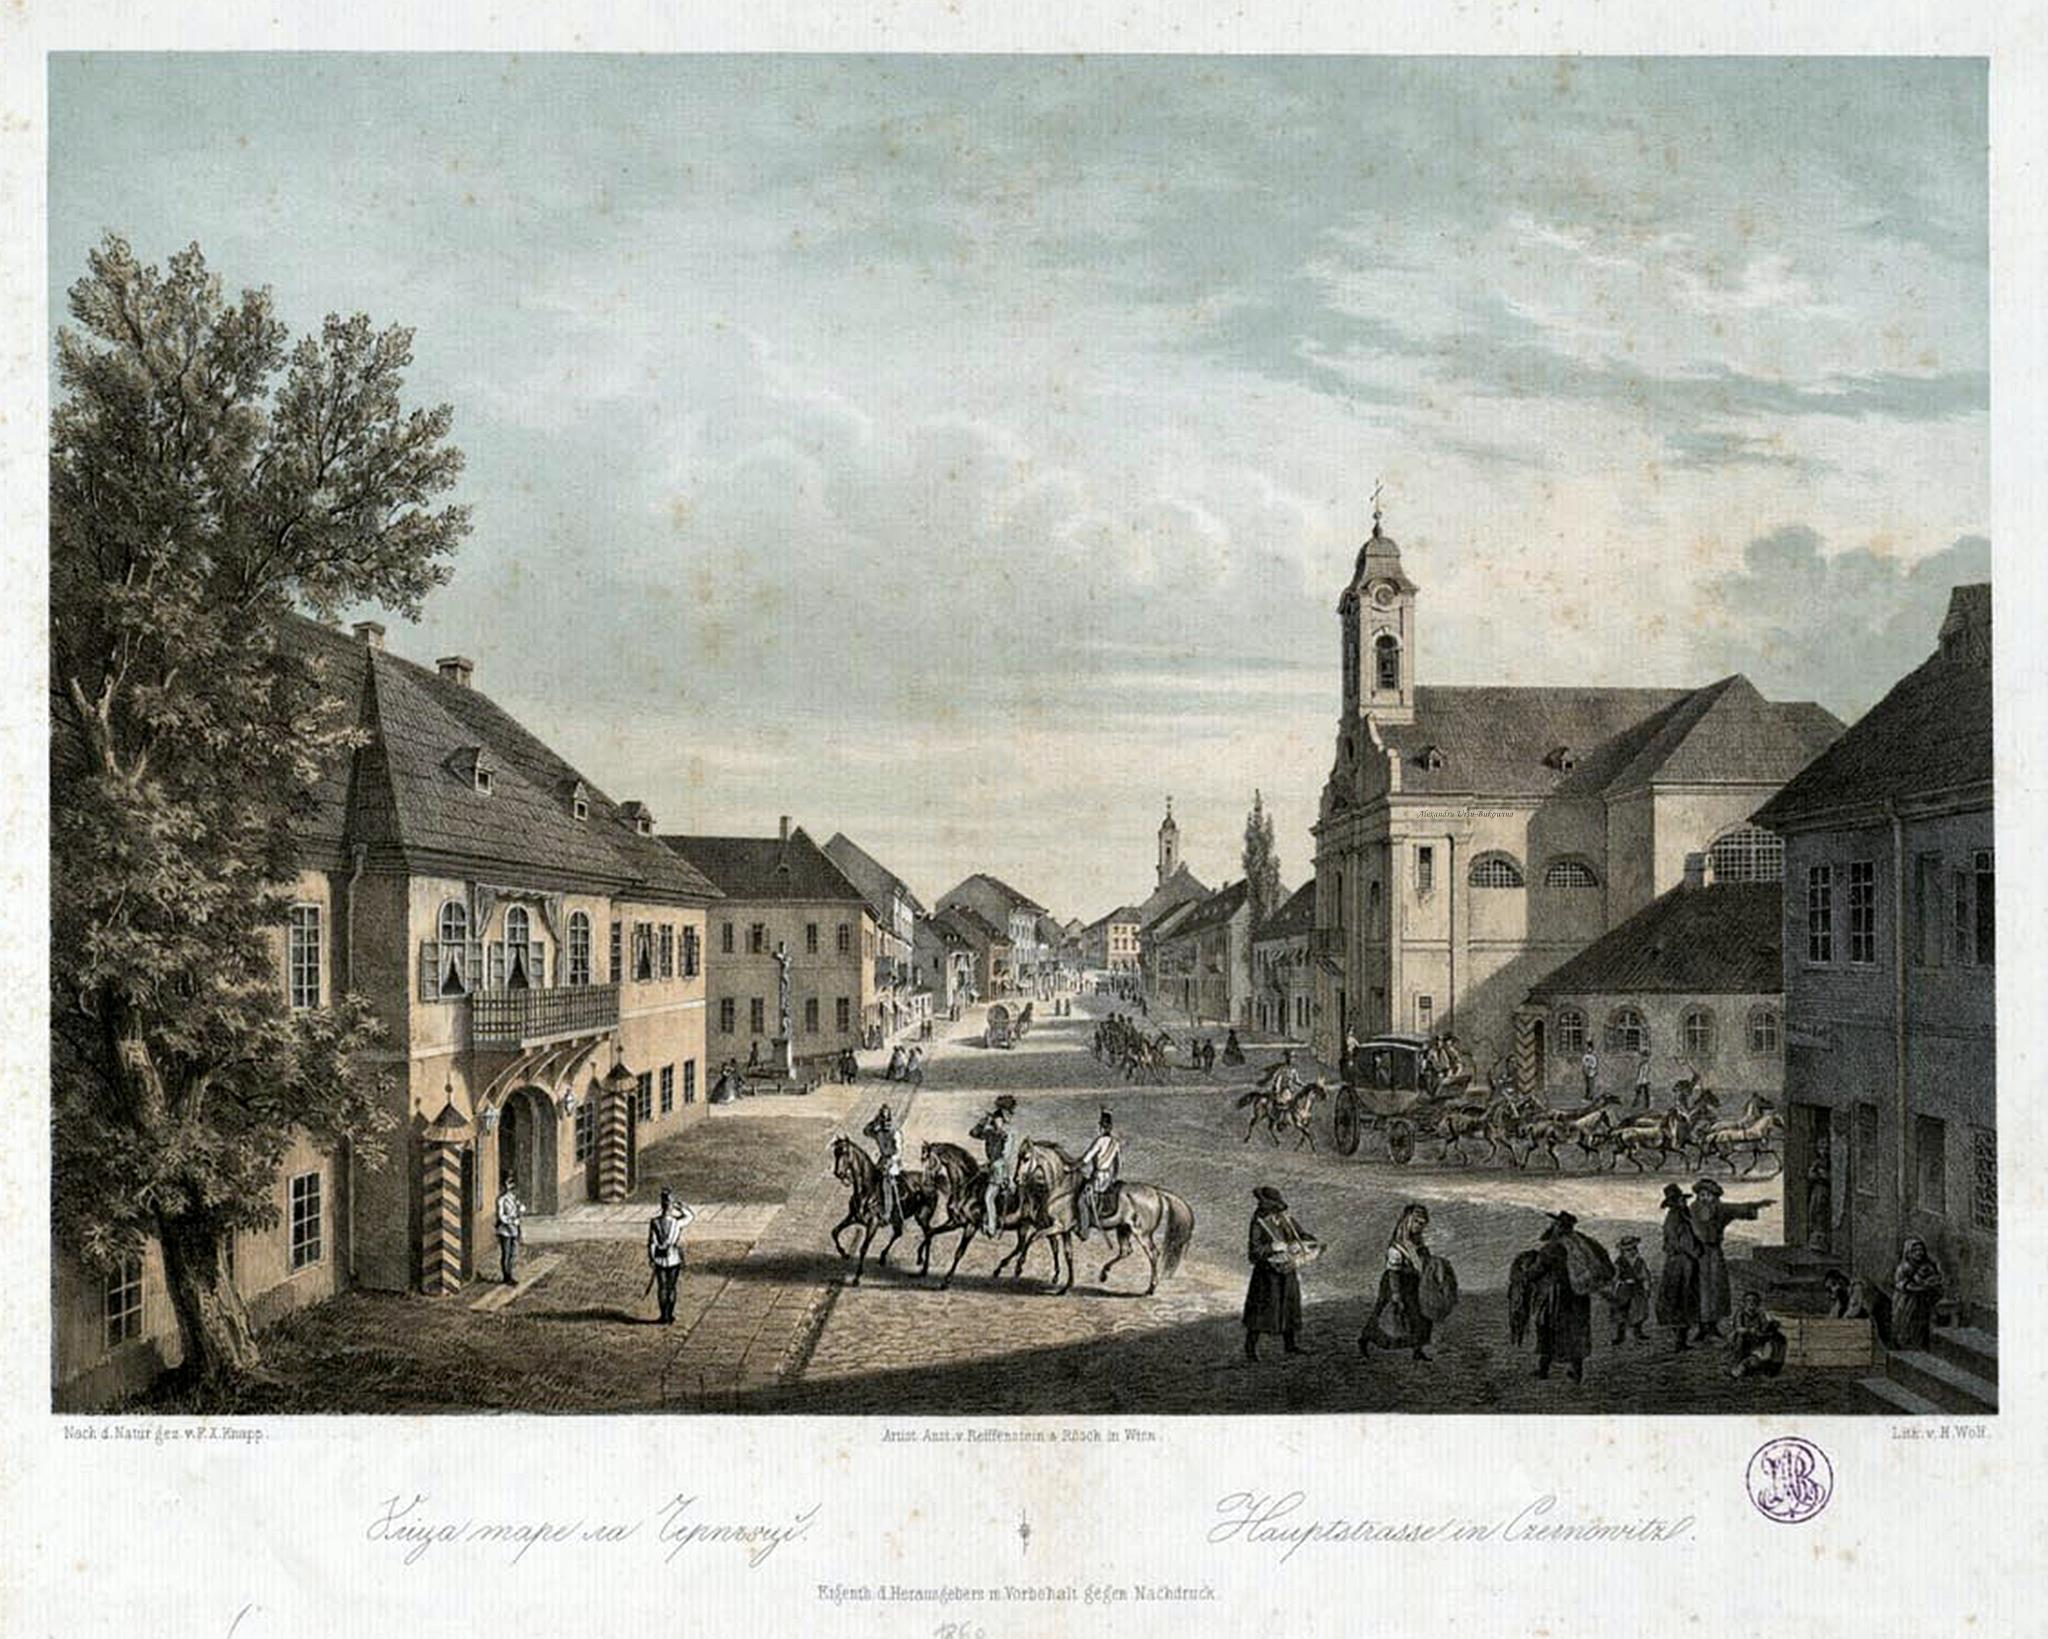 Oameni si locuri din Bucovina. Ulita mare la Cernauti. Hauptstrasse in Czernowitz. 1870. F. X. Knapp